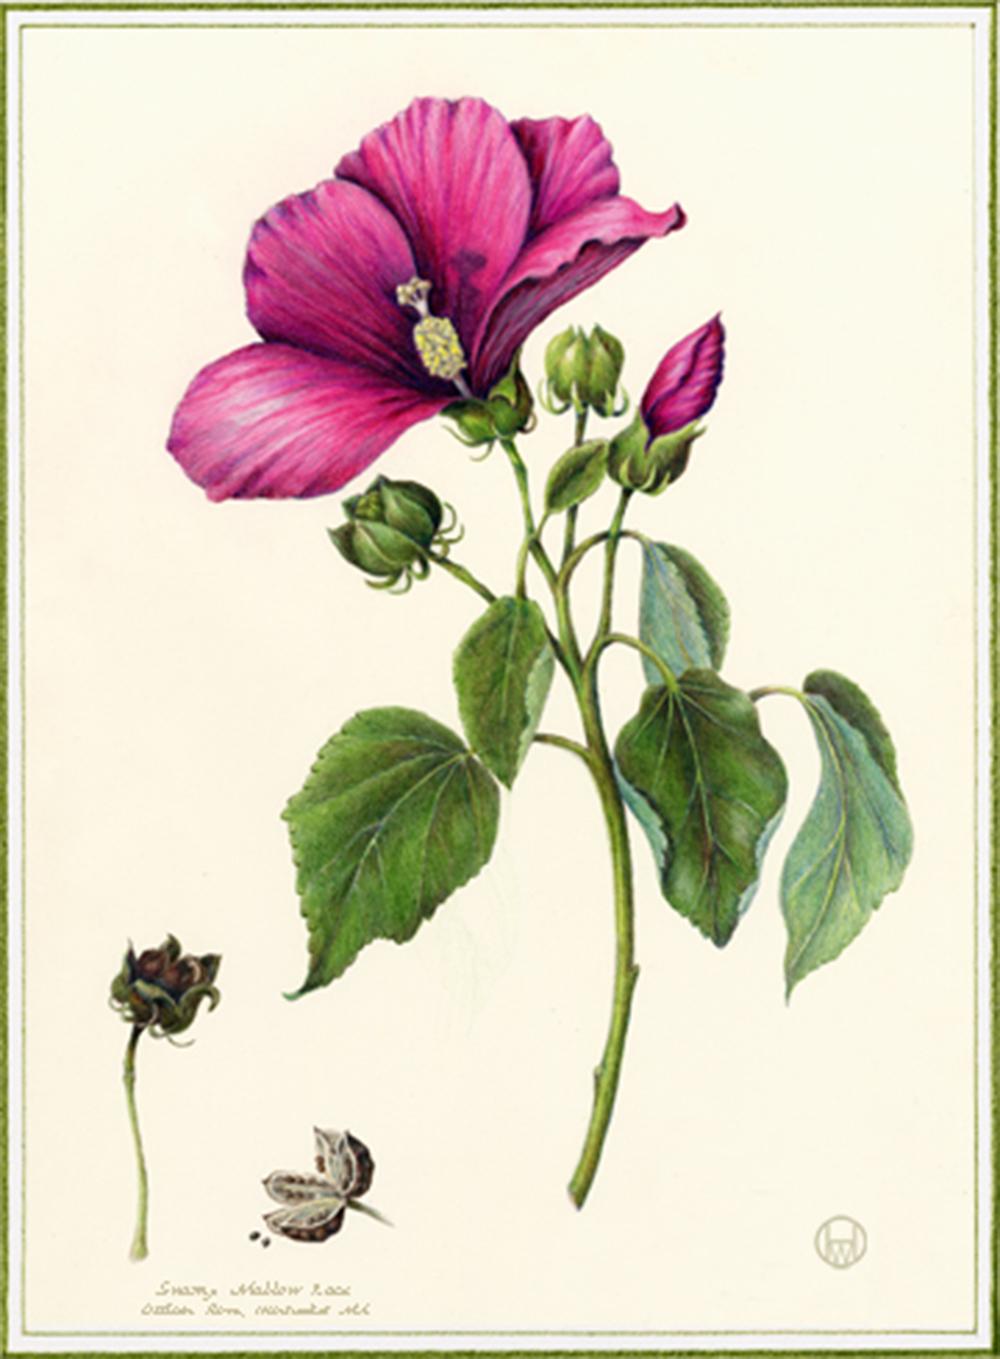 Swamp Mallow - Hibiscus moschetos